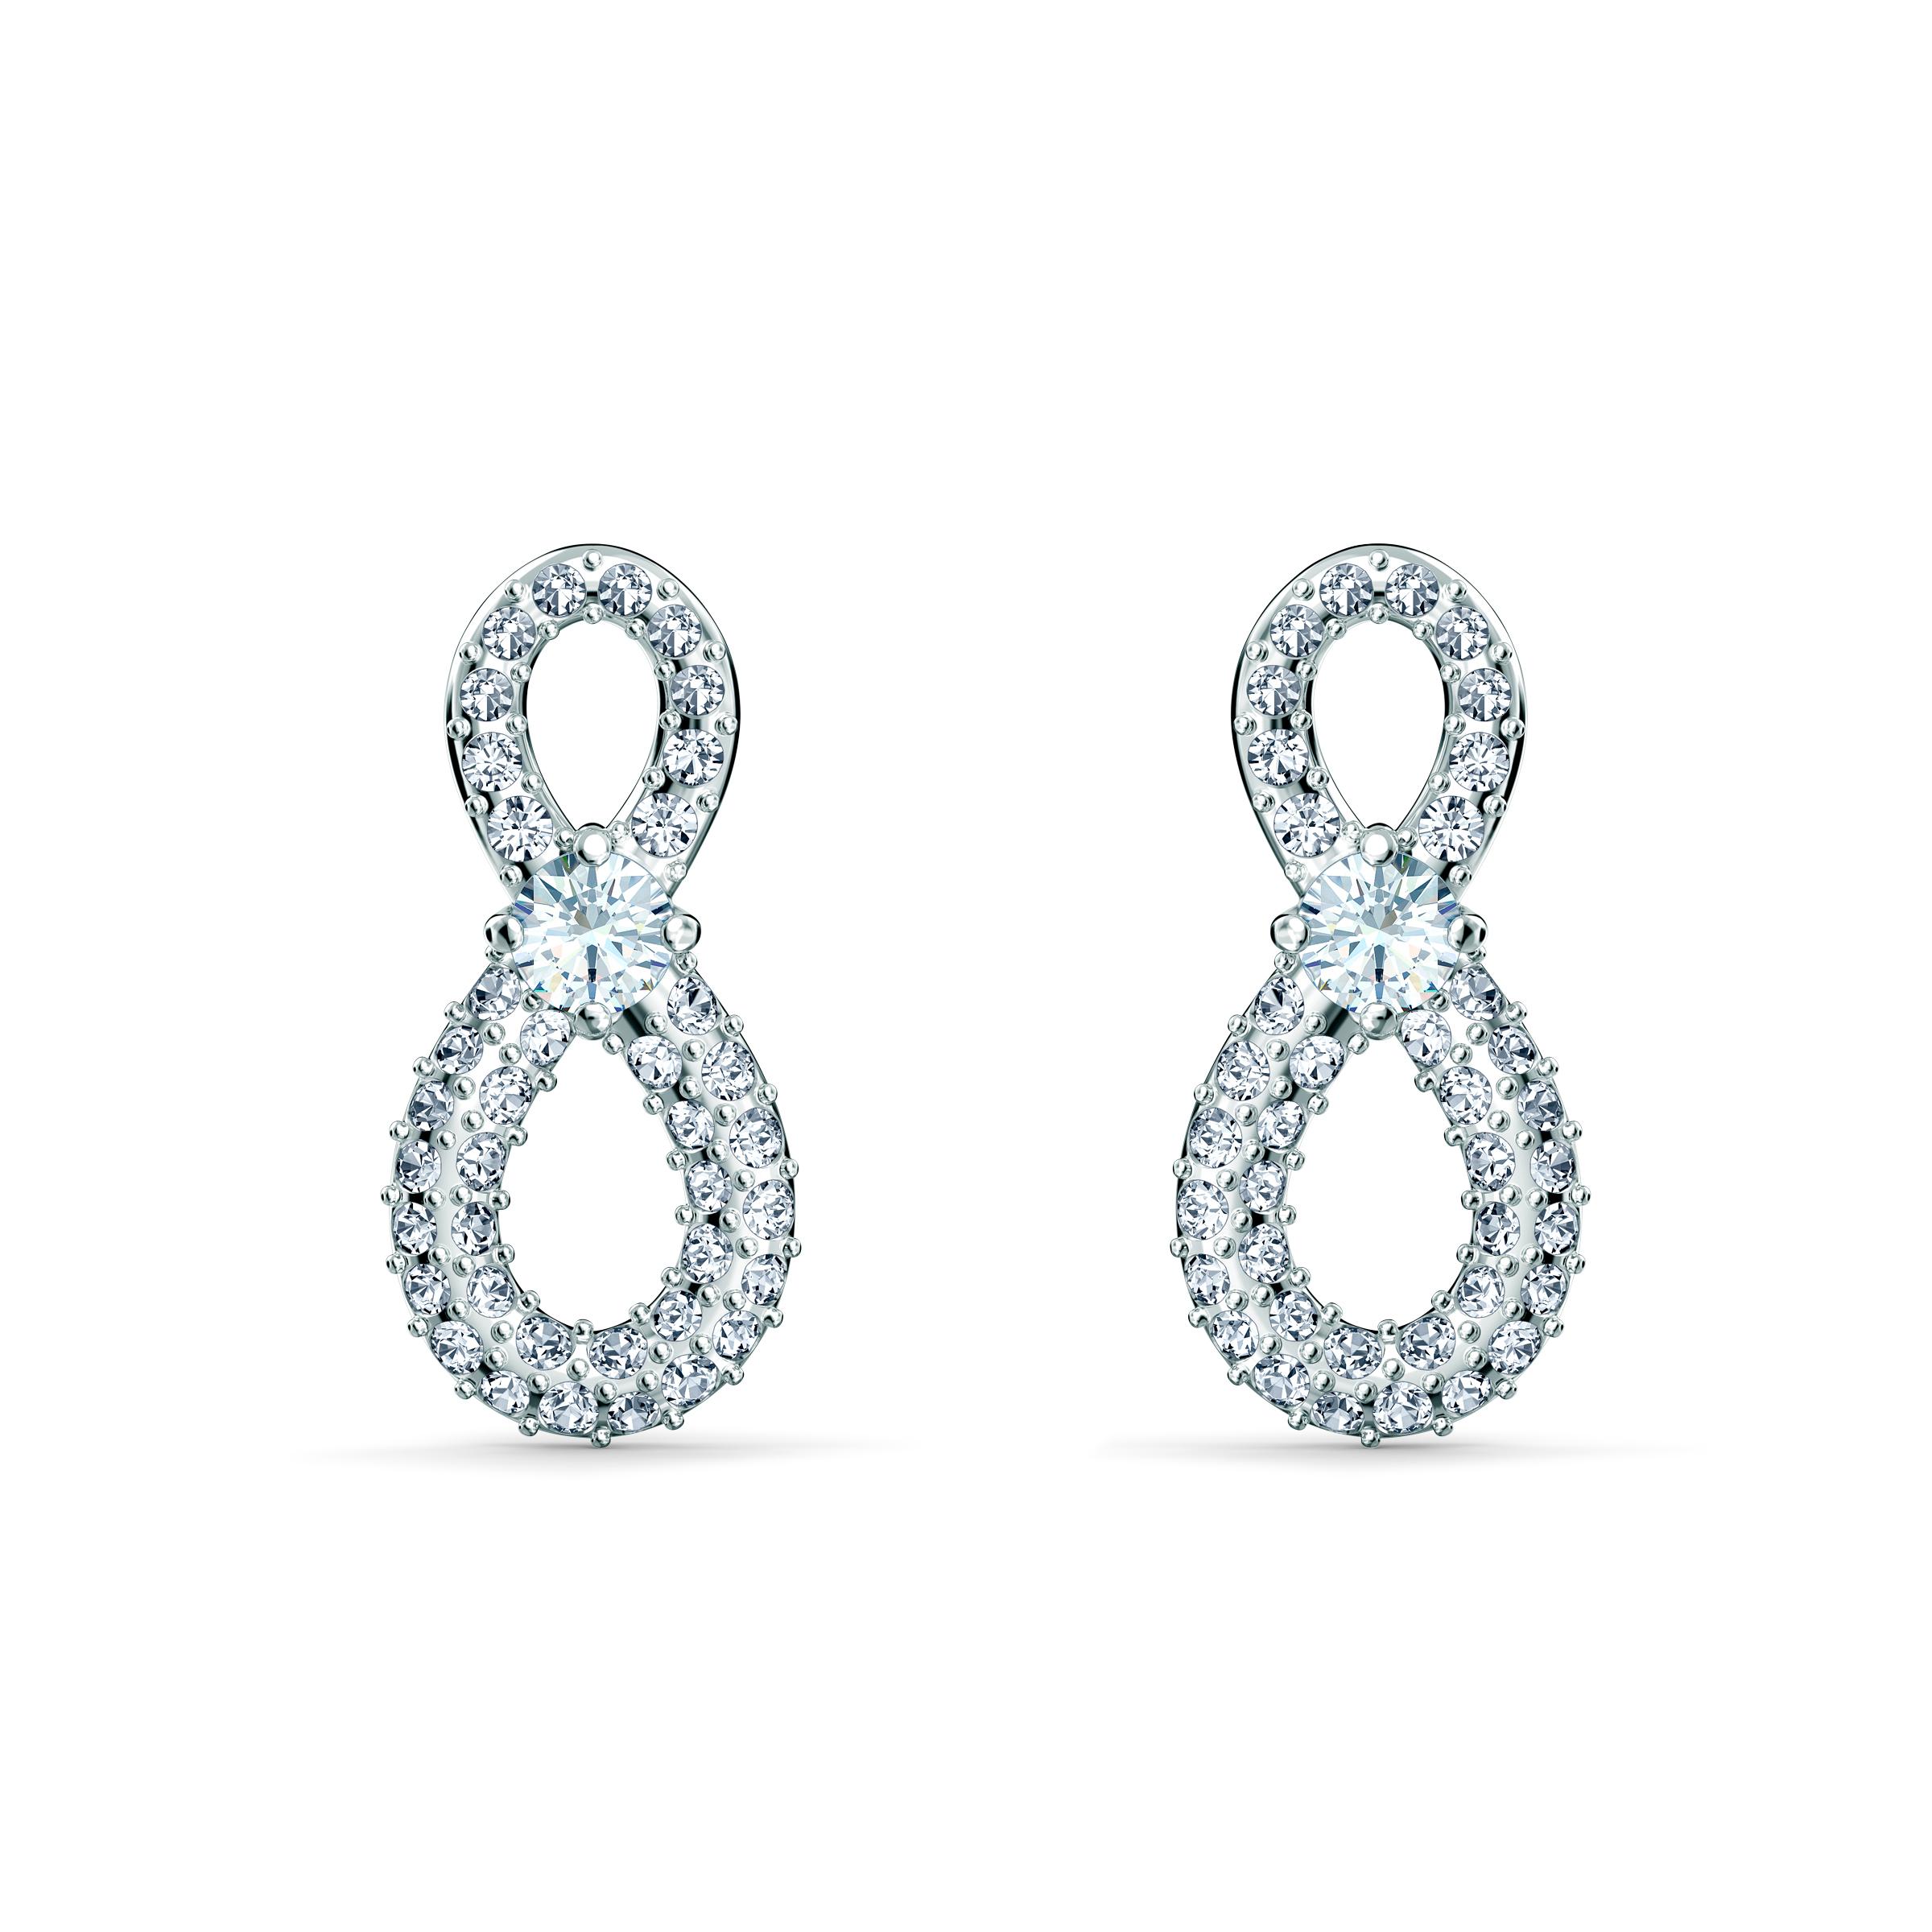 Boucles d'oreilles Swarovski Infinity Mini, blanc, métal rhodié, Swarovski